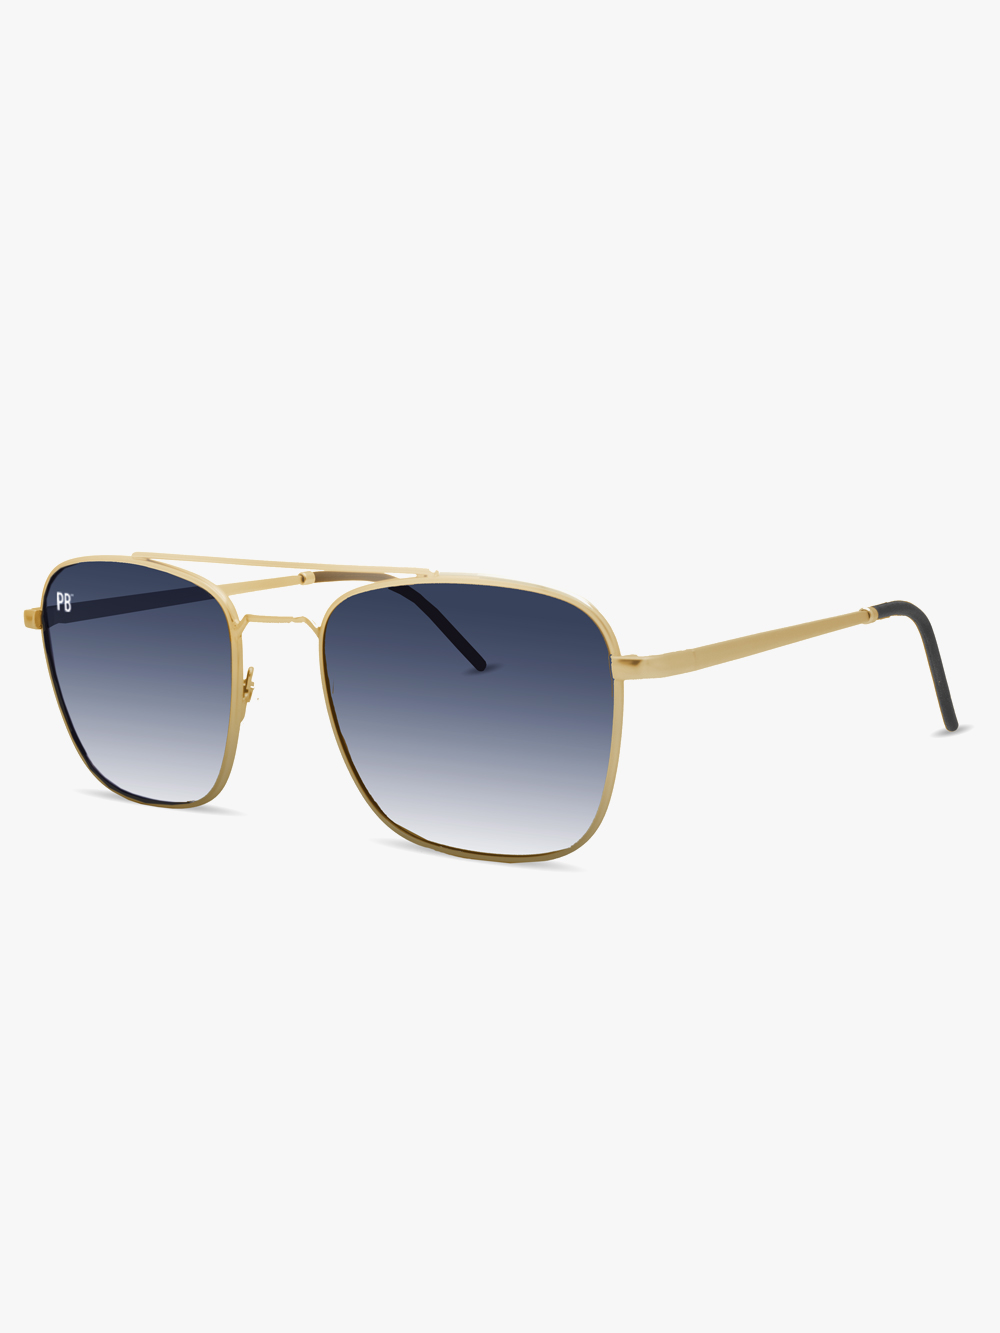 PB-Sunglasses-Legend-Gold-Gradient-Blue